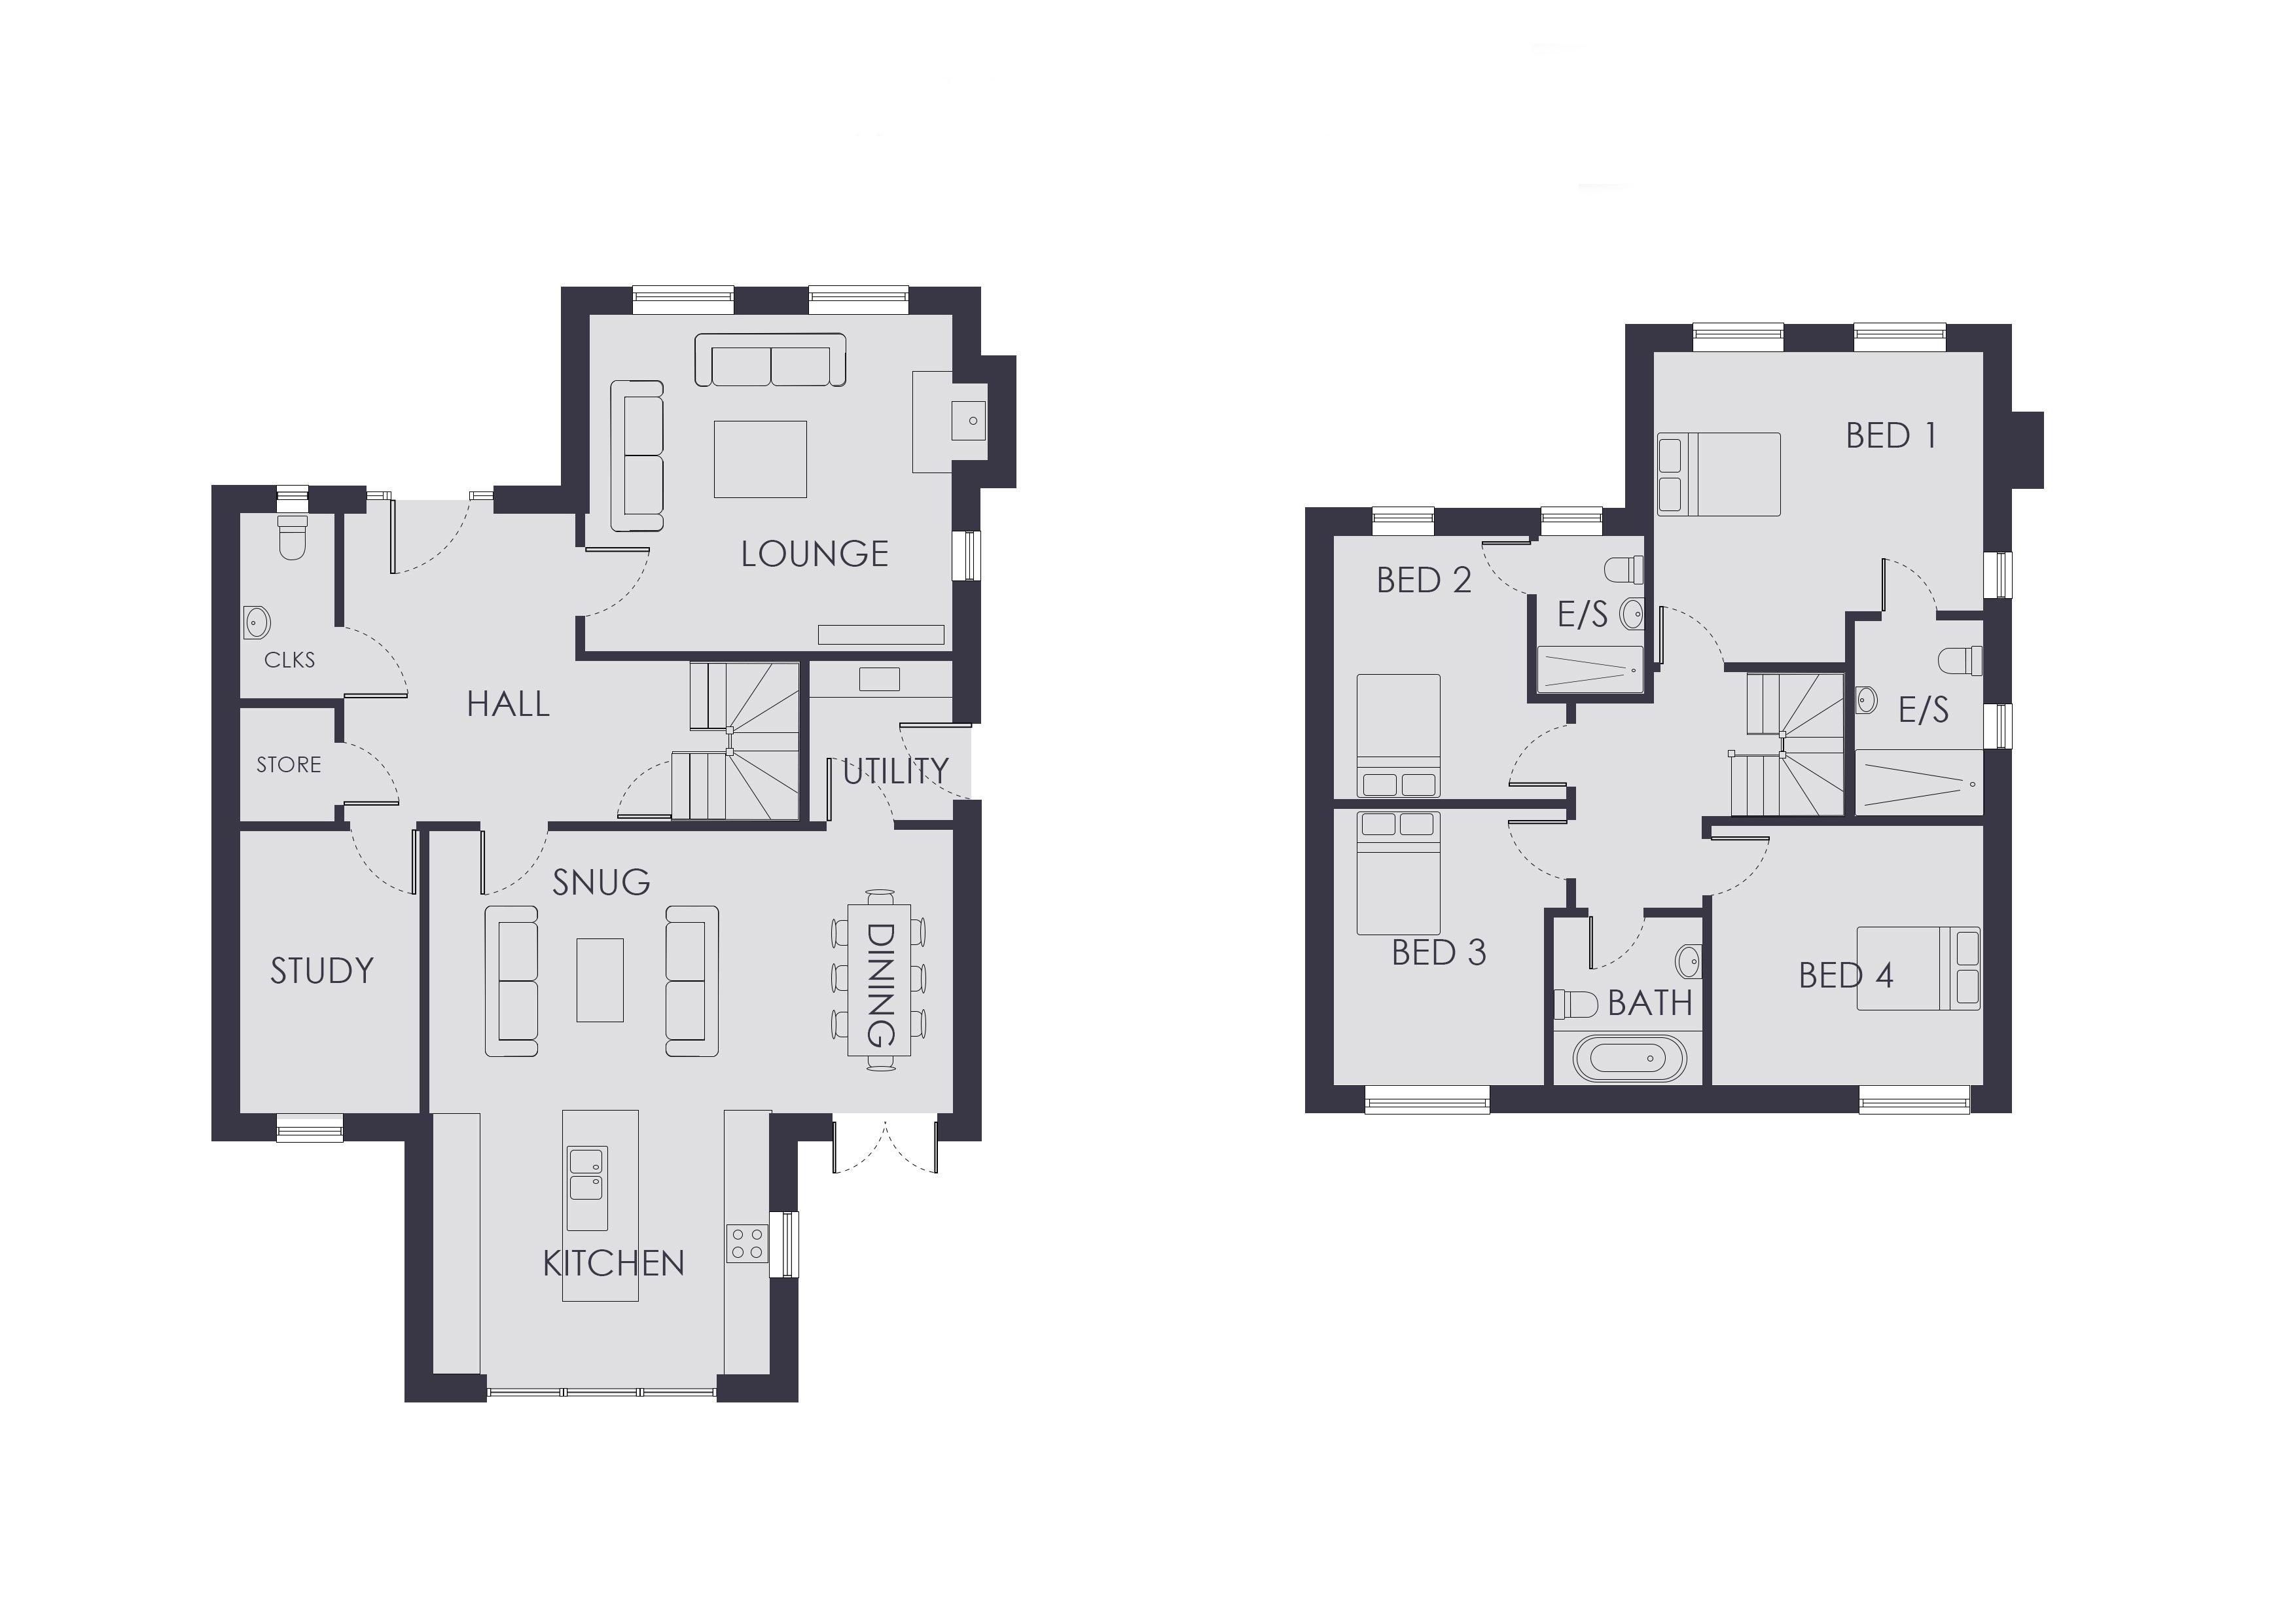 Mill Ash House (Plot 1) Millfield Place , Easingwold, York property floorplan